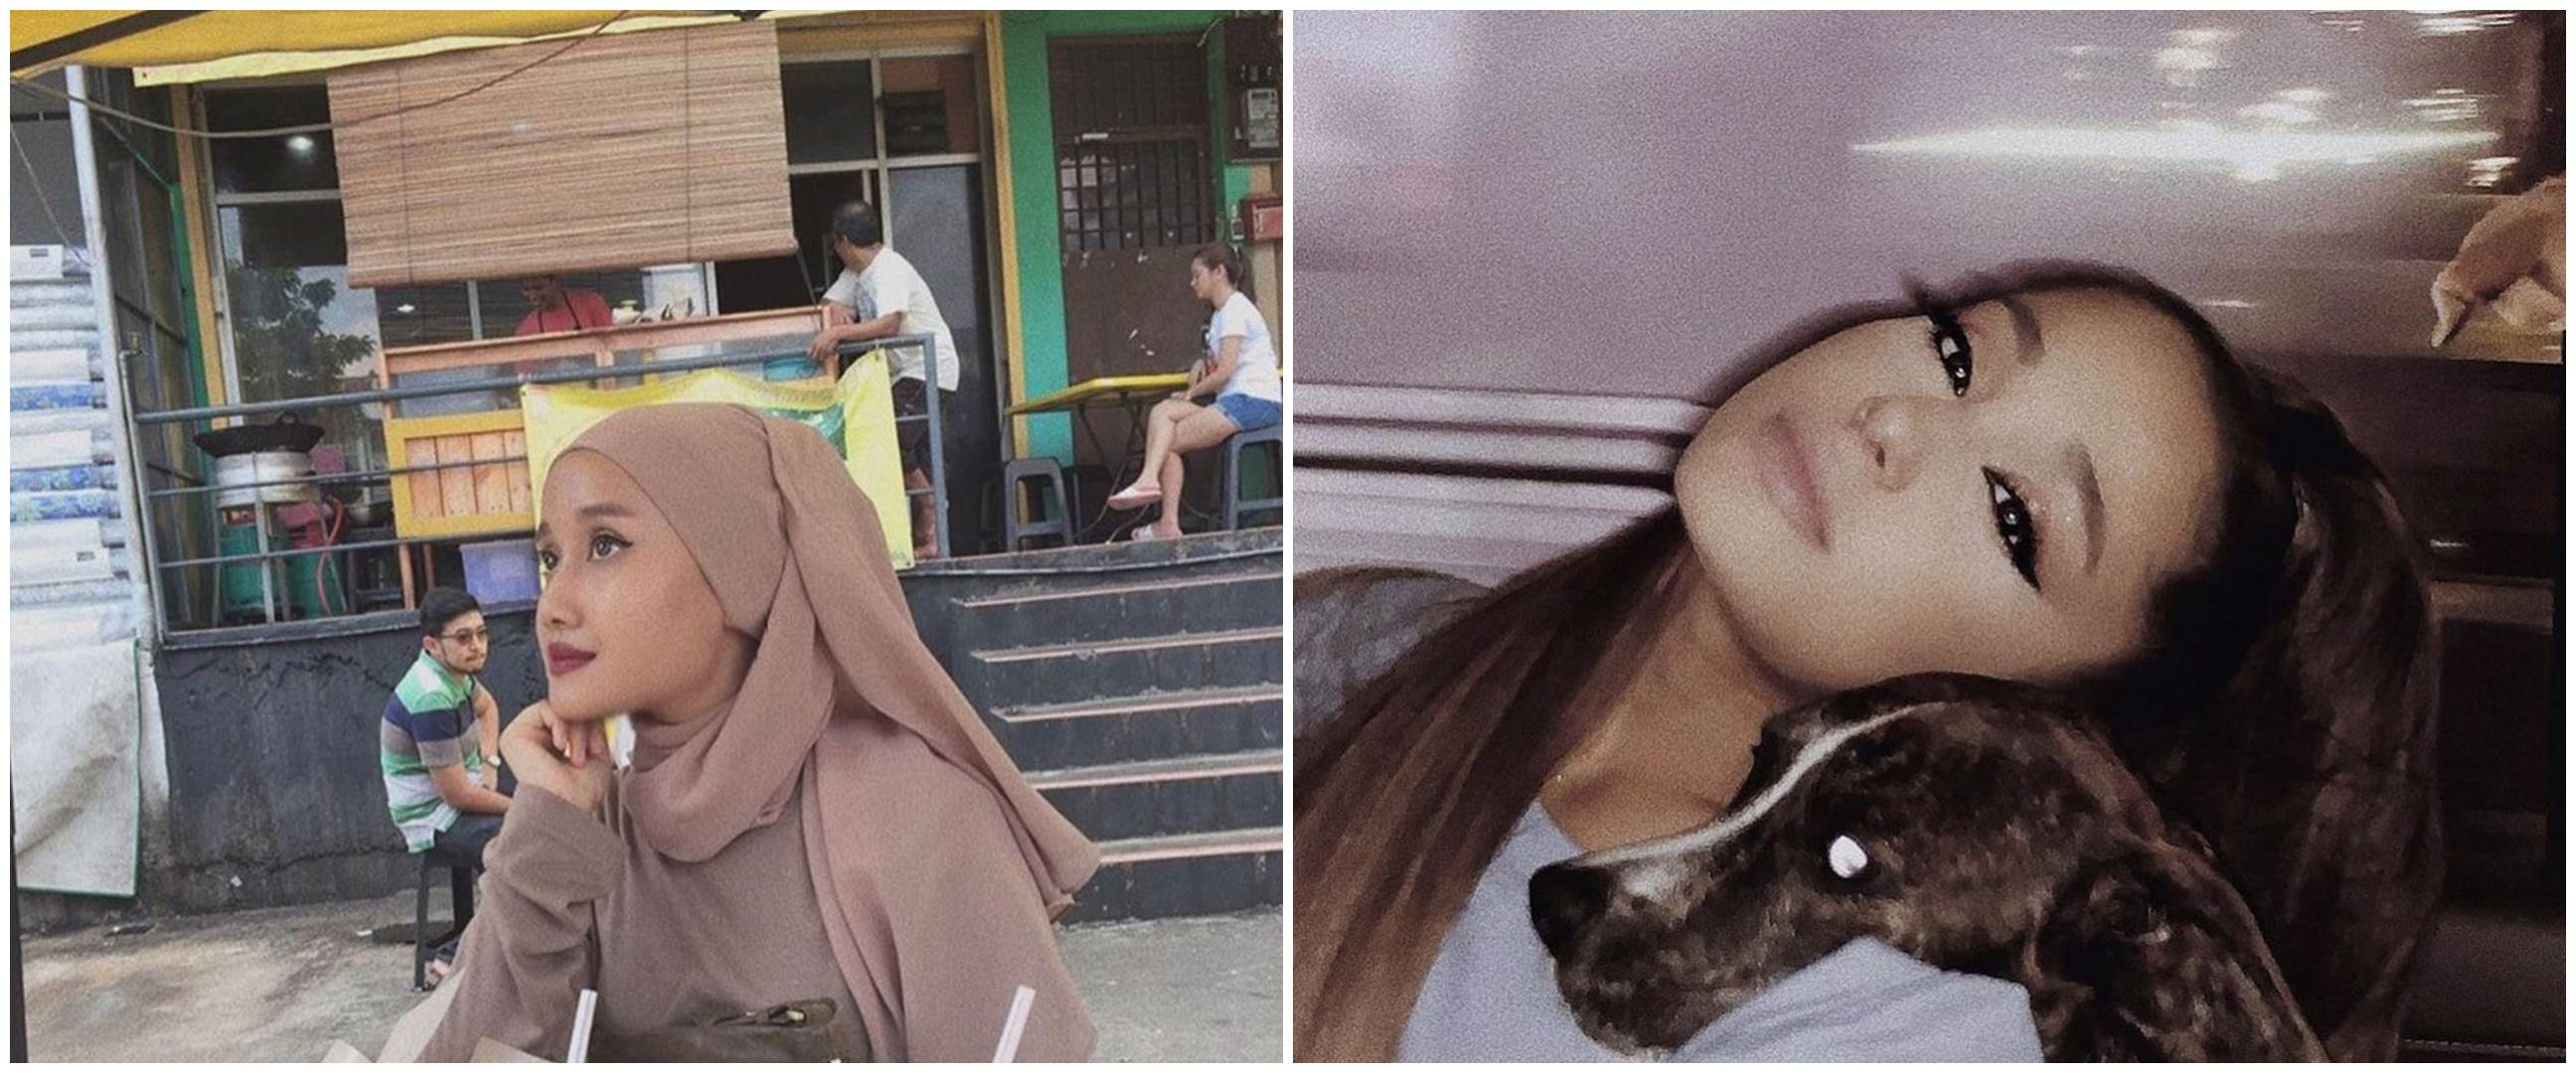 10 Potret Nabila, hijabers viral mirip Ariana Grande